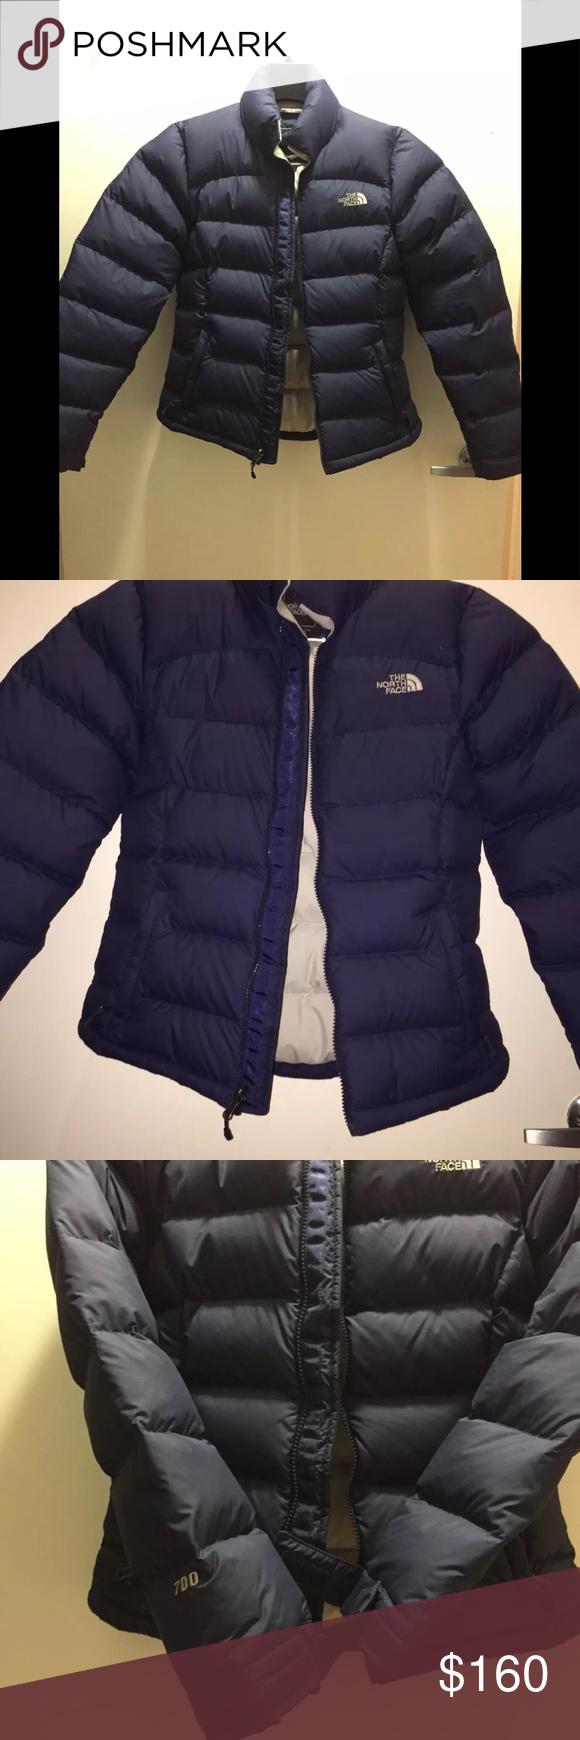 Women S North Face Puffer Bubble Coat Navy Size S Women S North Face 700 Coat Size S New Without Tags The North F Clothes Design Bubble Coat North Face Jacket [ 1740 x 580 Pixel ]